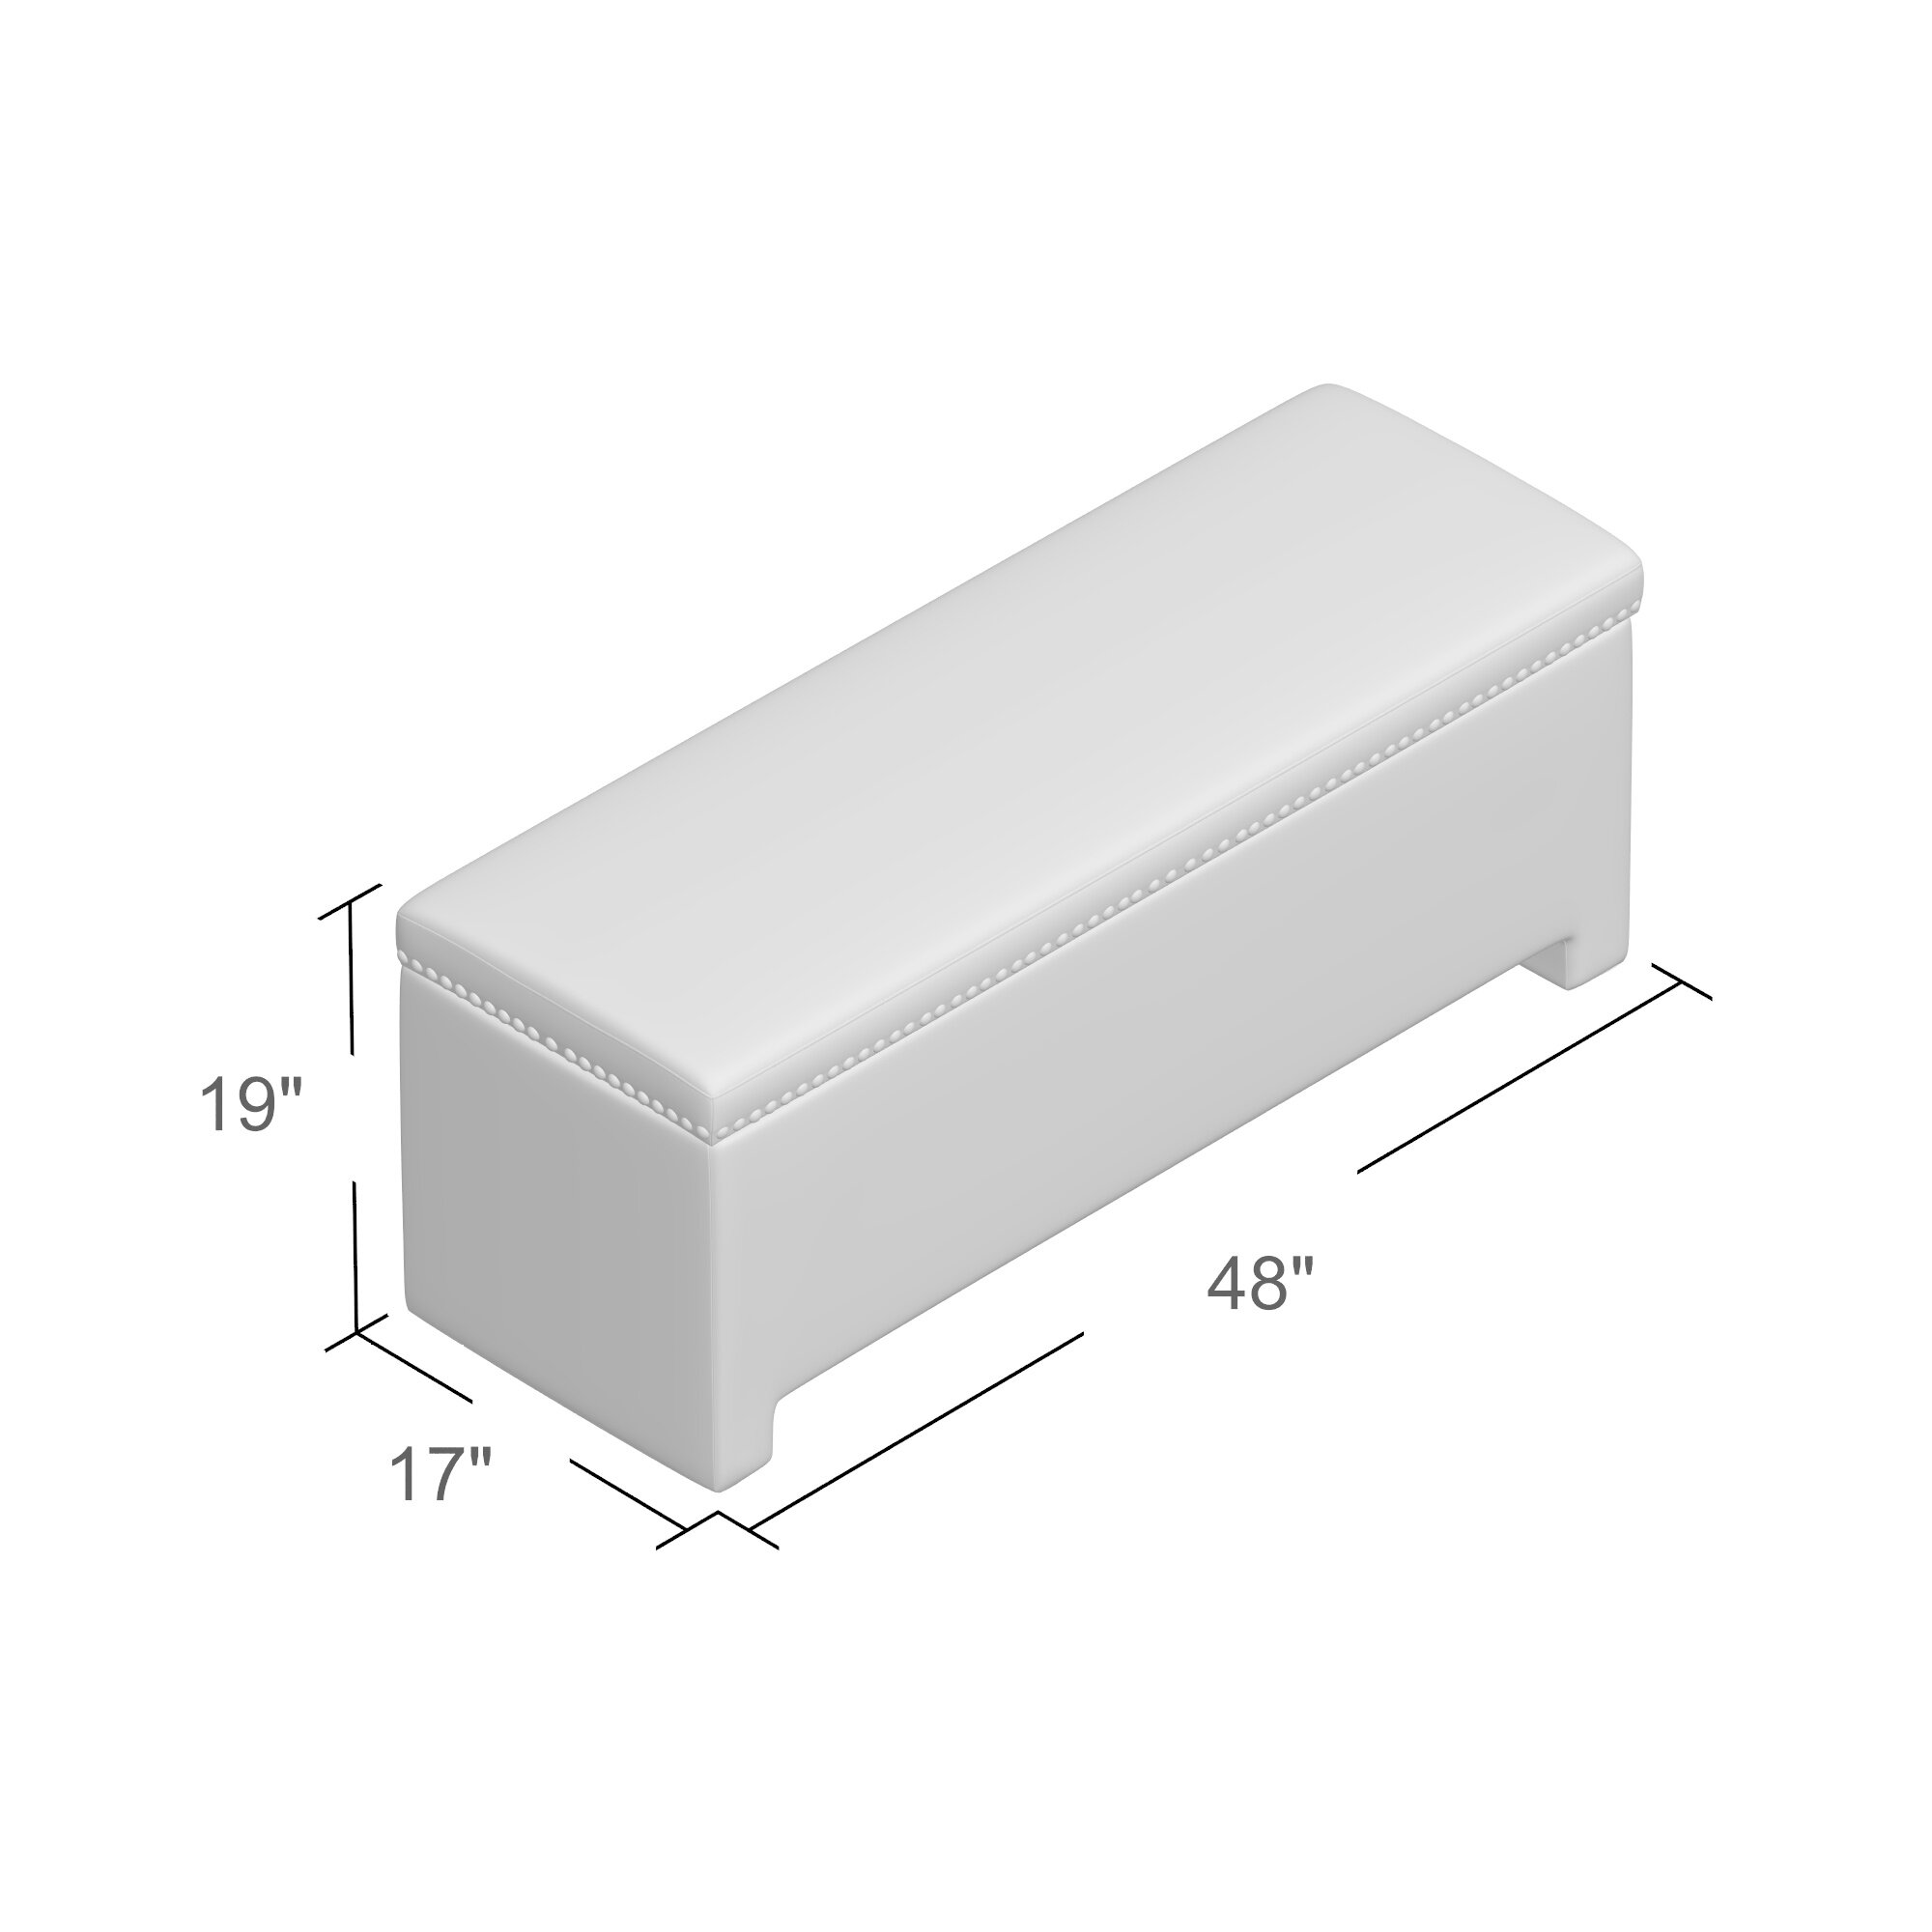 Alcott Hill Cloville Upholstered Storage Bedroom Bench